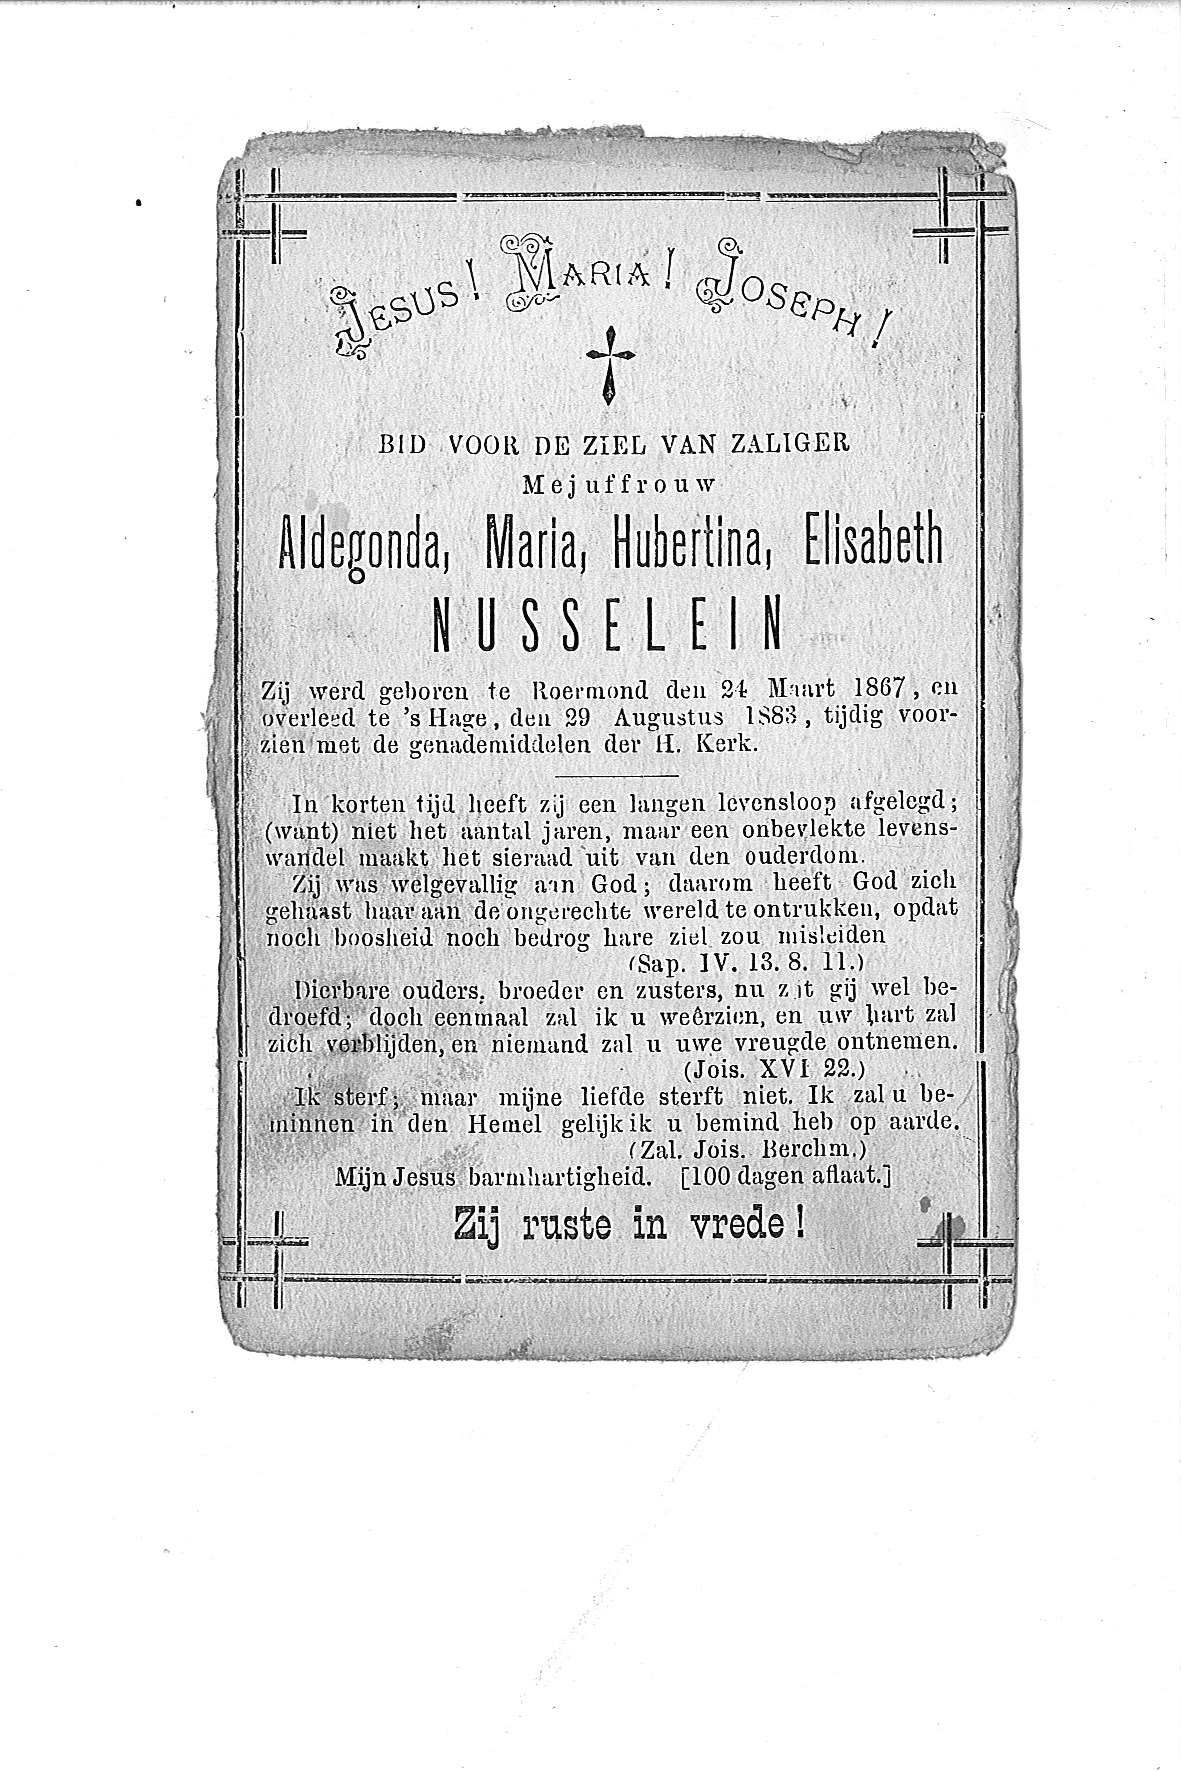 Aldegonda-Maria-Hubertina-Elisabeth(1883)20100316131238_00037.jpg